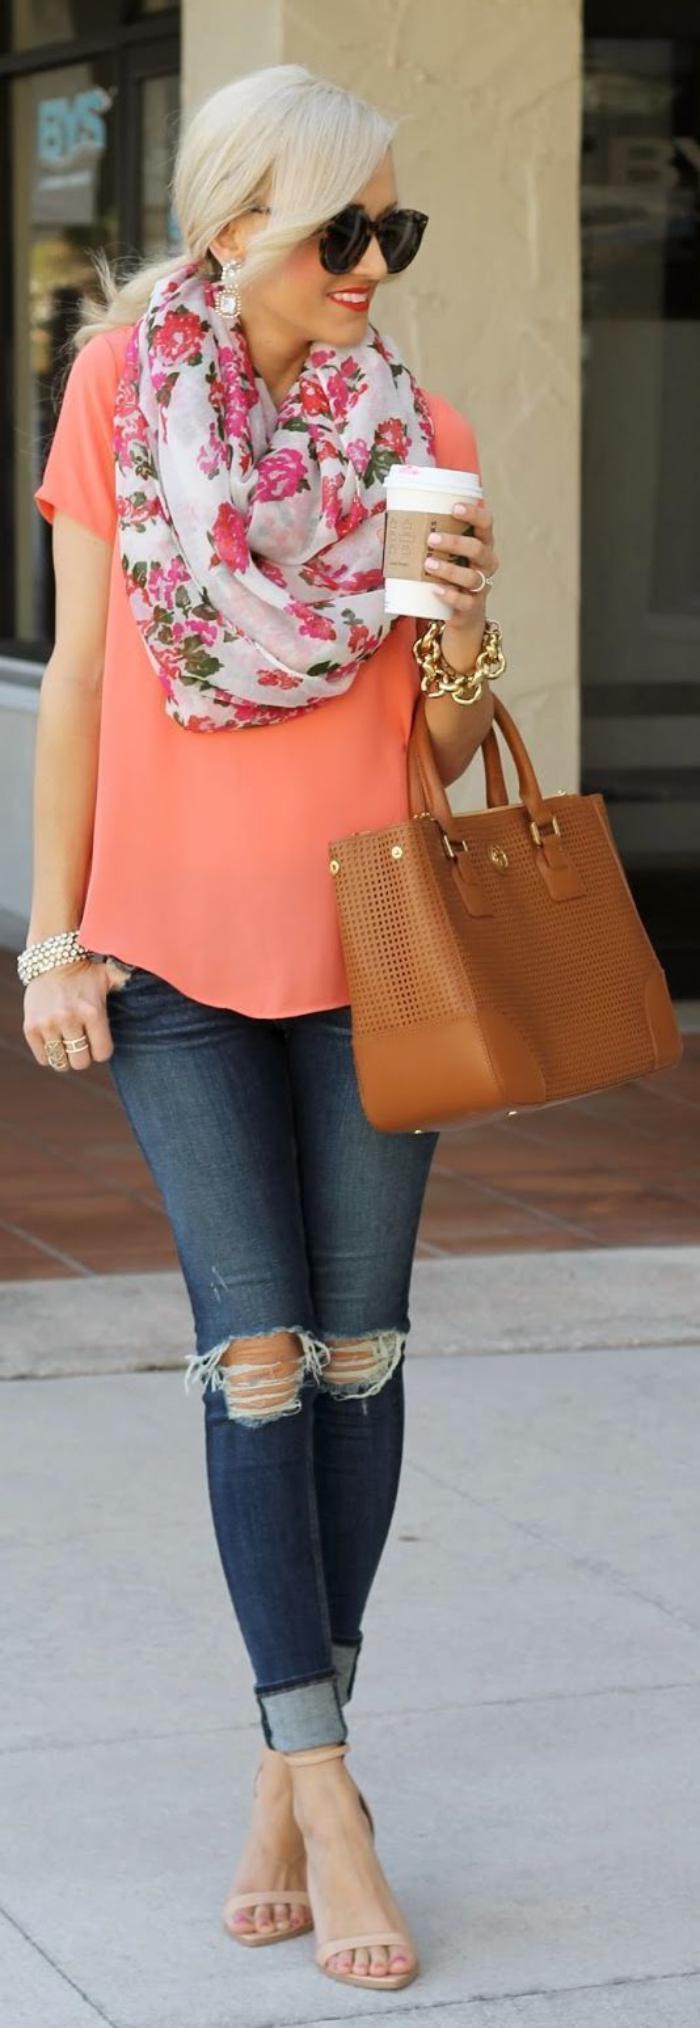 sac-camel-jolie-chemise-rose-foulard-d'été